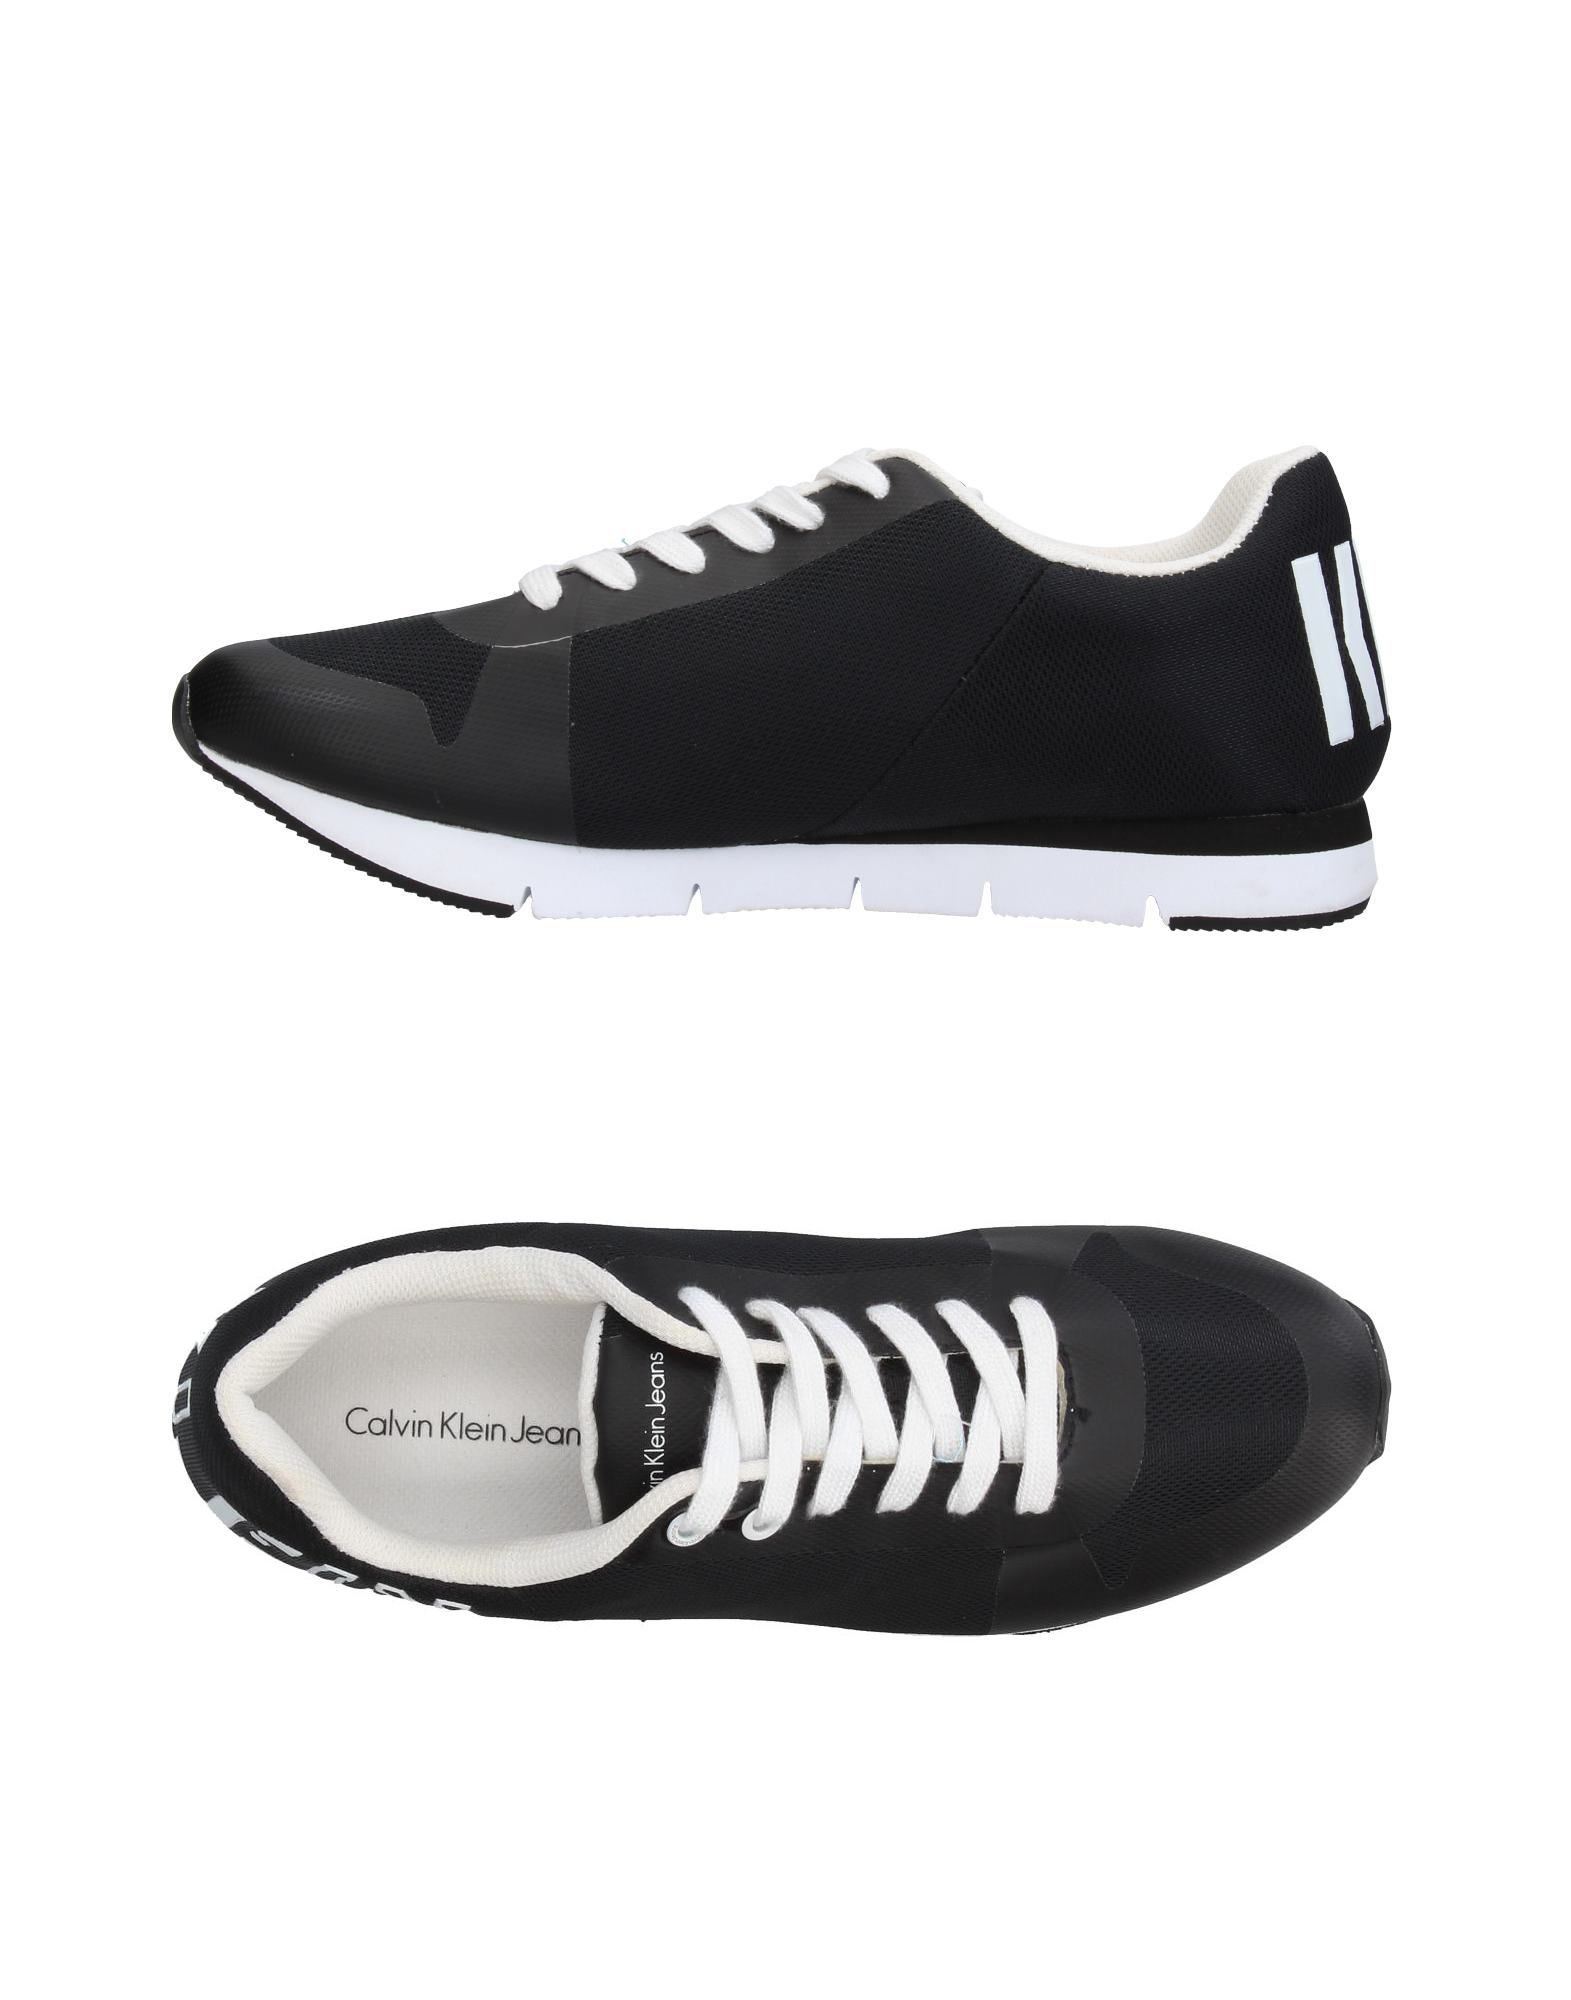 Sneakers Calvin Klein Jeans Uomo - 11391550FT